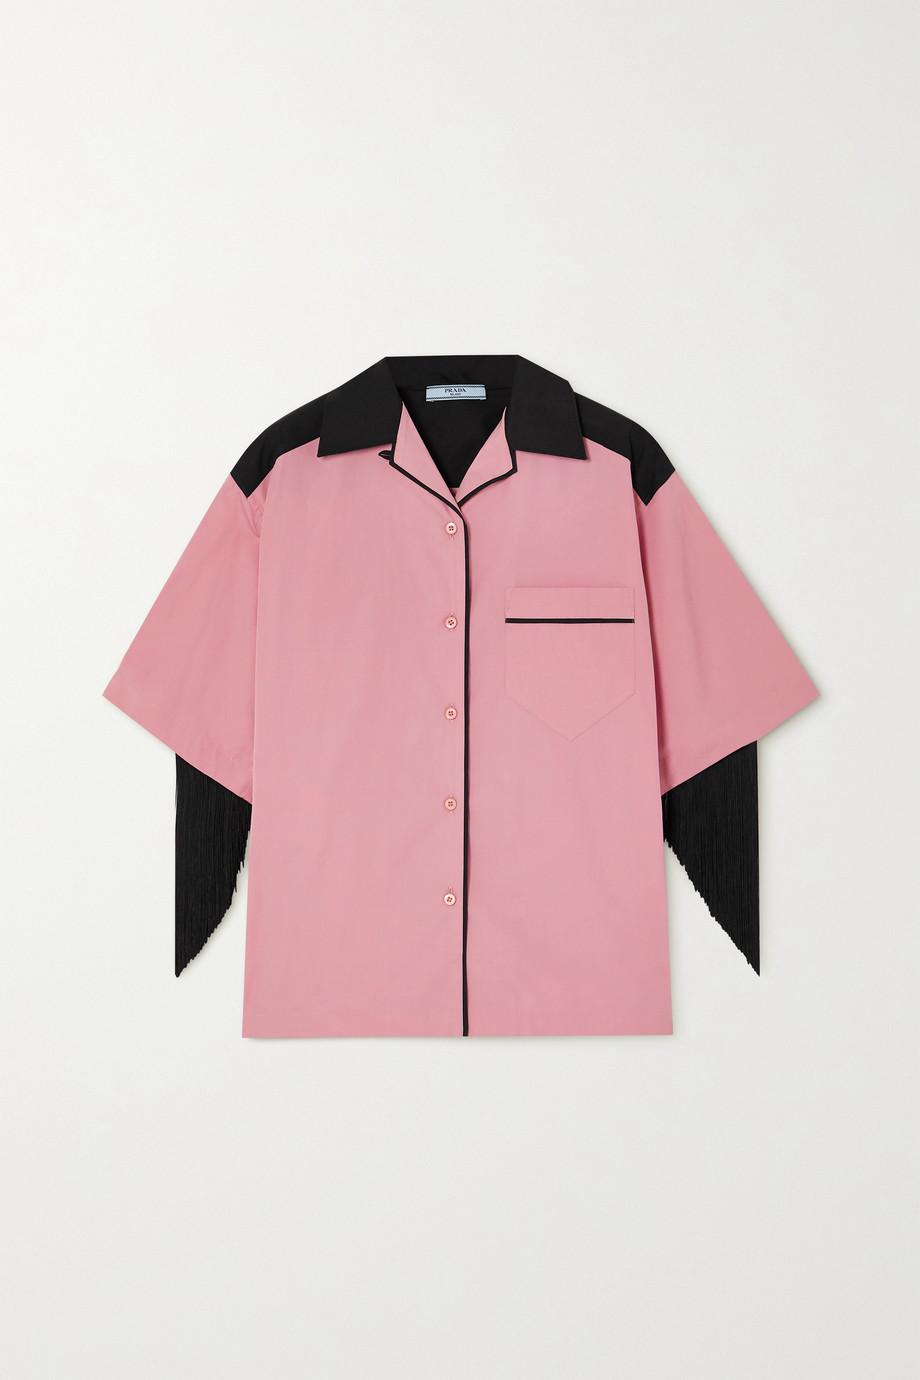 Prada Fringed cotton-poplin shirt